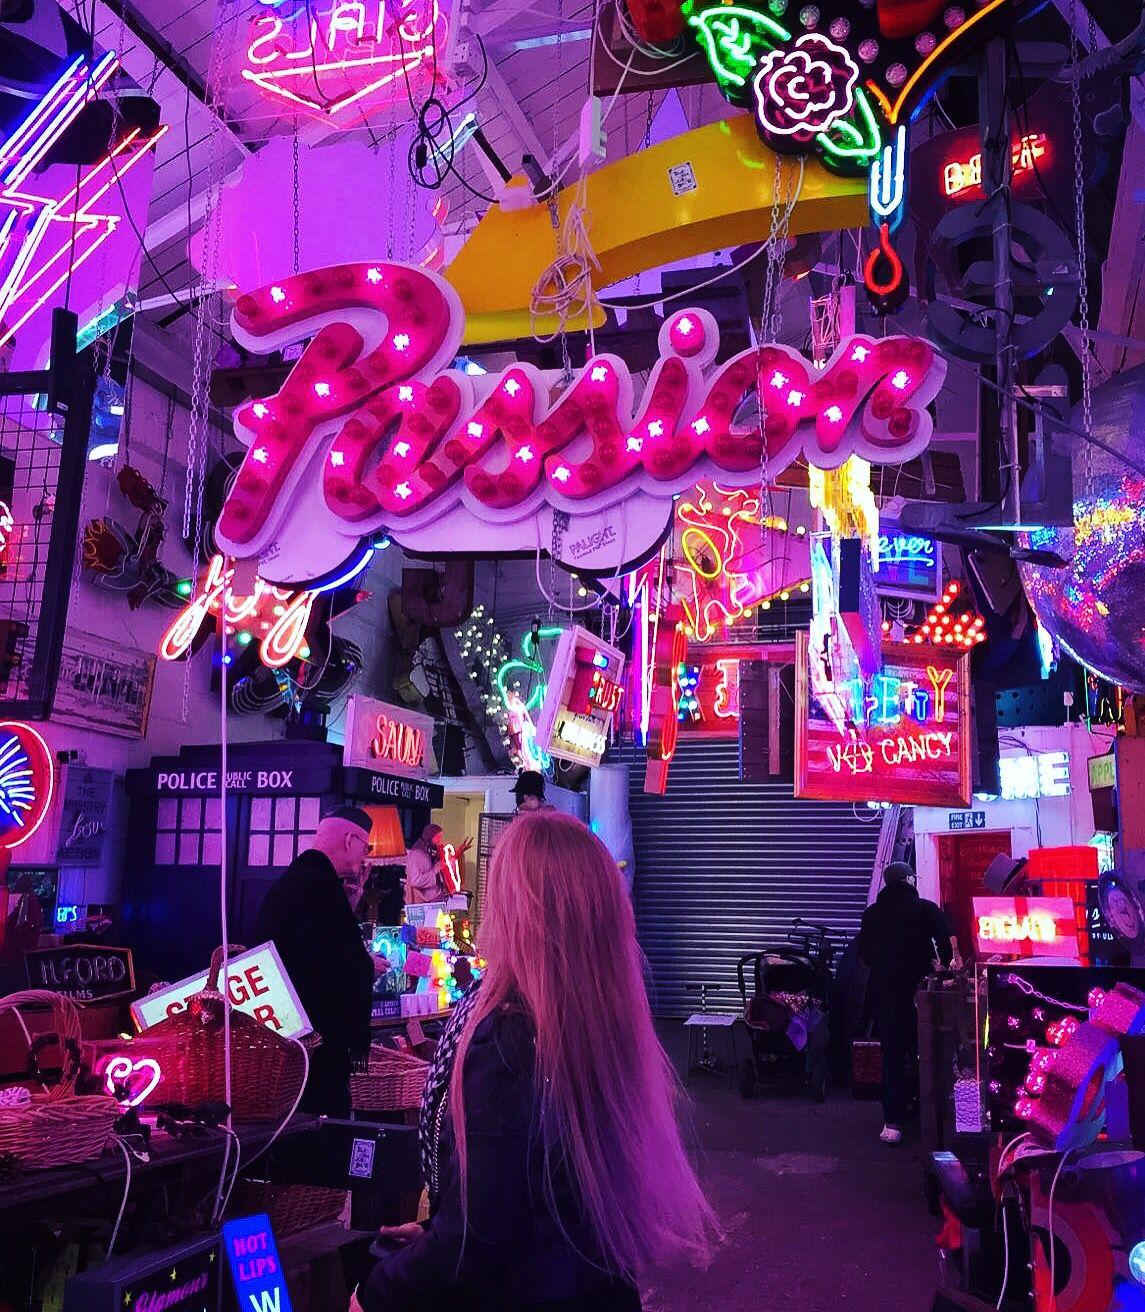 neon lights aesthetic purple london photography gods junkyard own walthamstow heaven amazing ever vaporwave most moe retro dean city cyberpunk